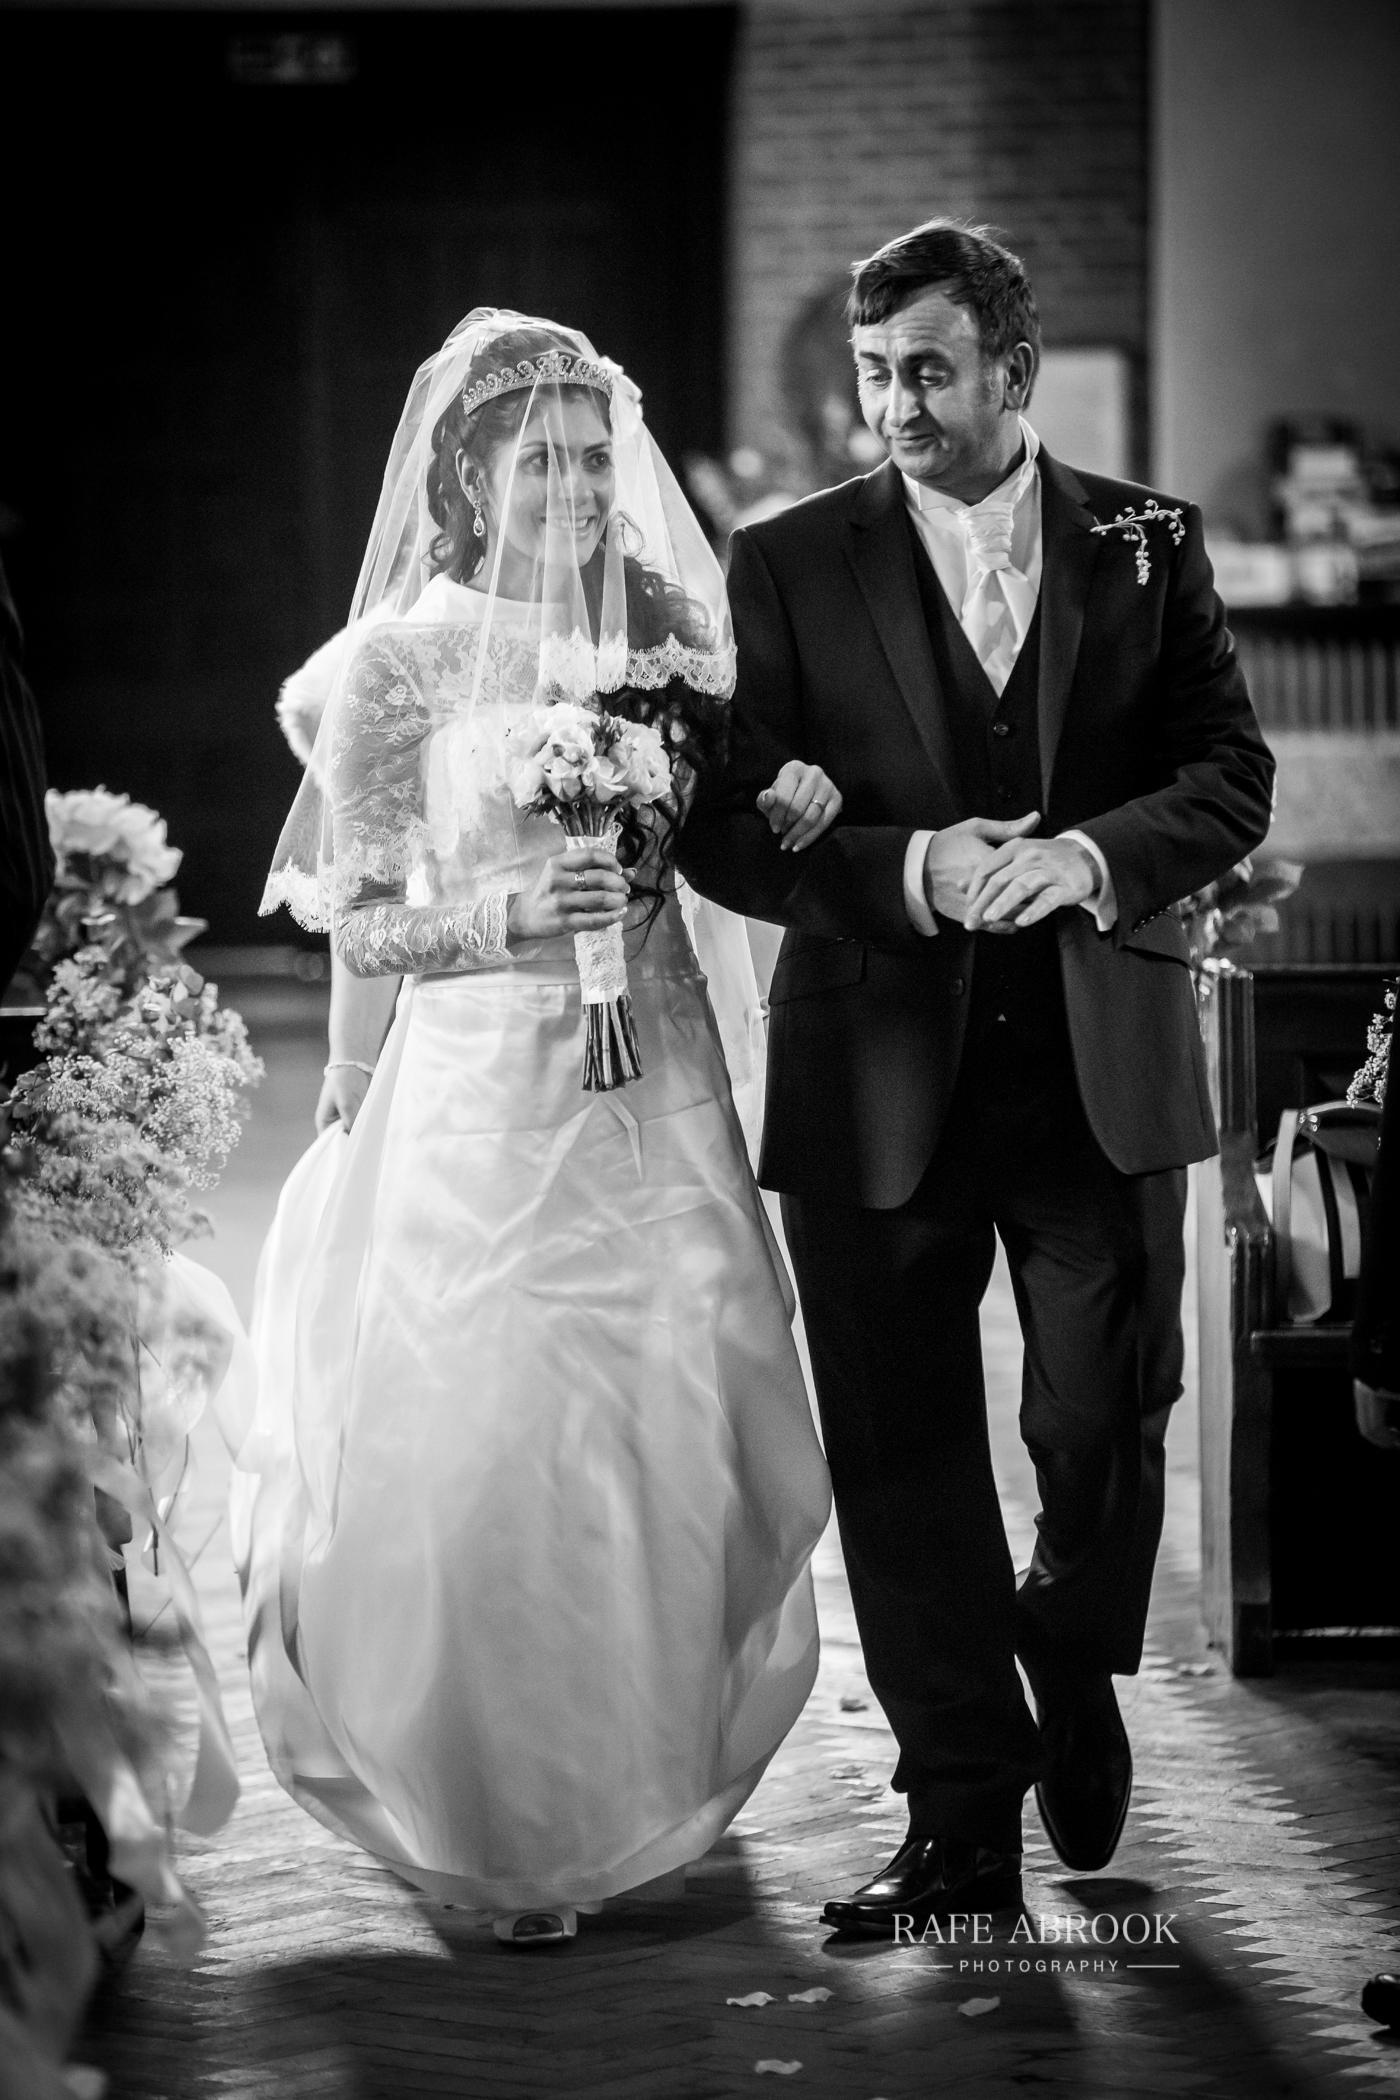 roma & pete wedding hampstead shenley hertfordshire -142.jpg